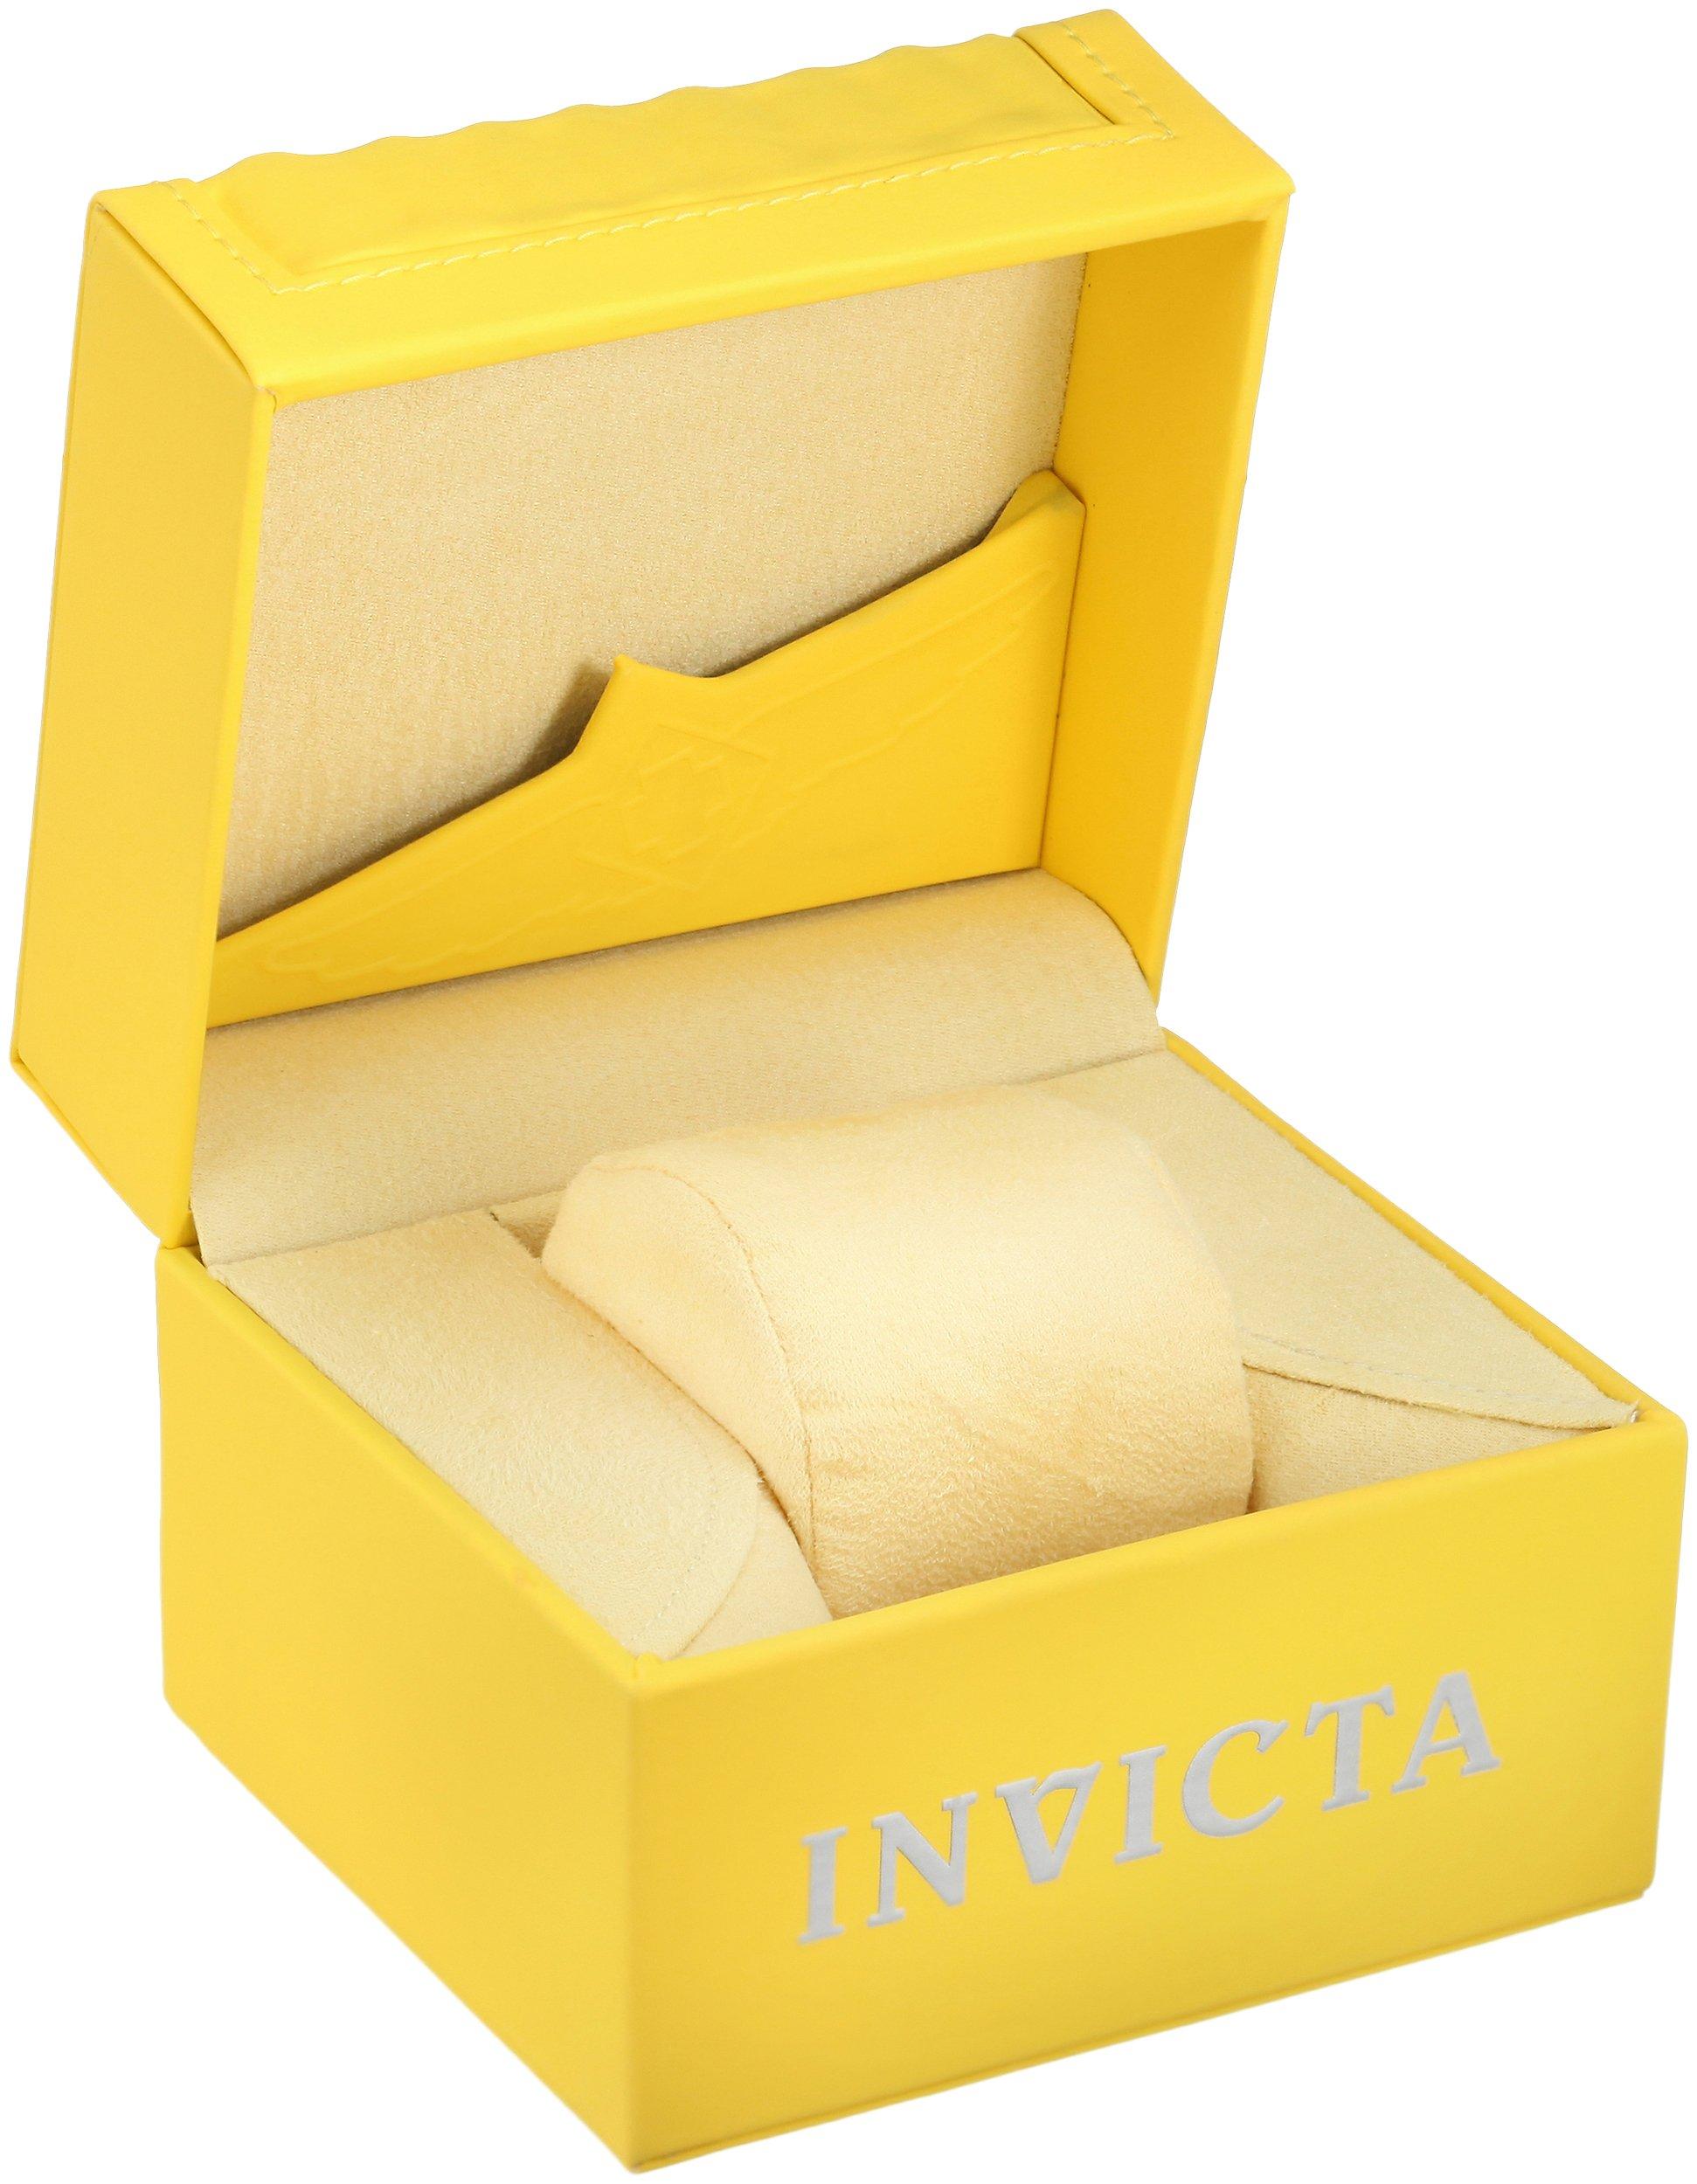 Invicta Men's 0075 Pro Diver Chronograph 18k Gold-Plated Watch by Invicta (Image #5)